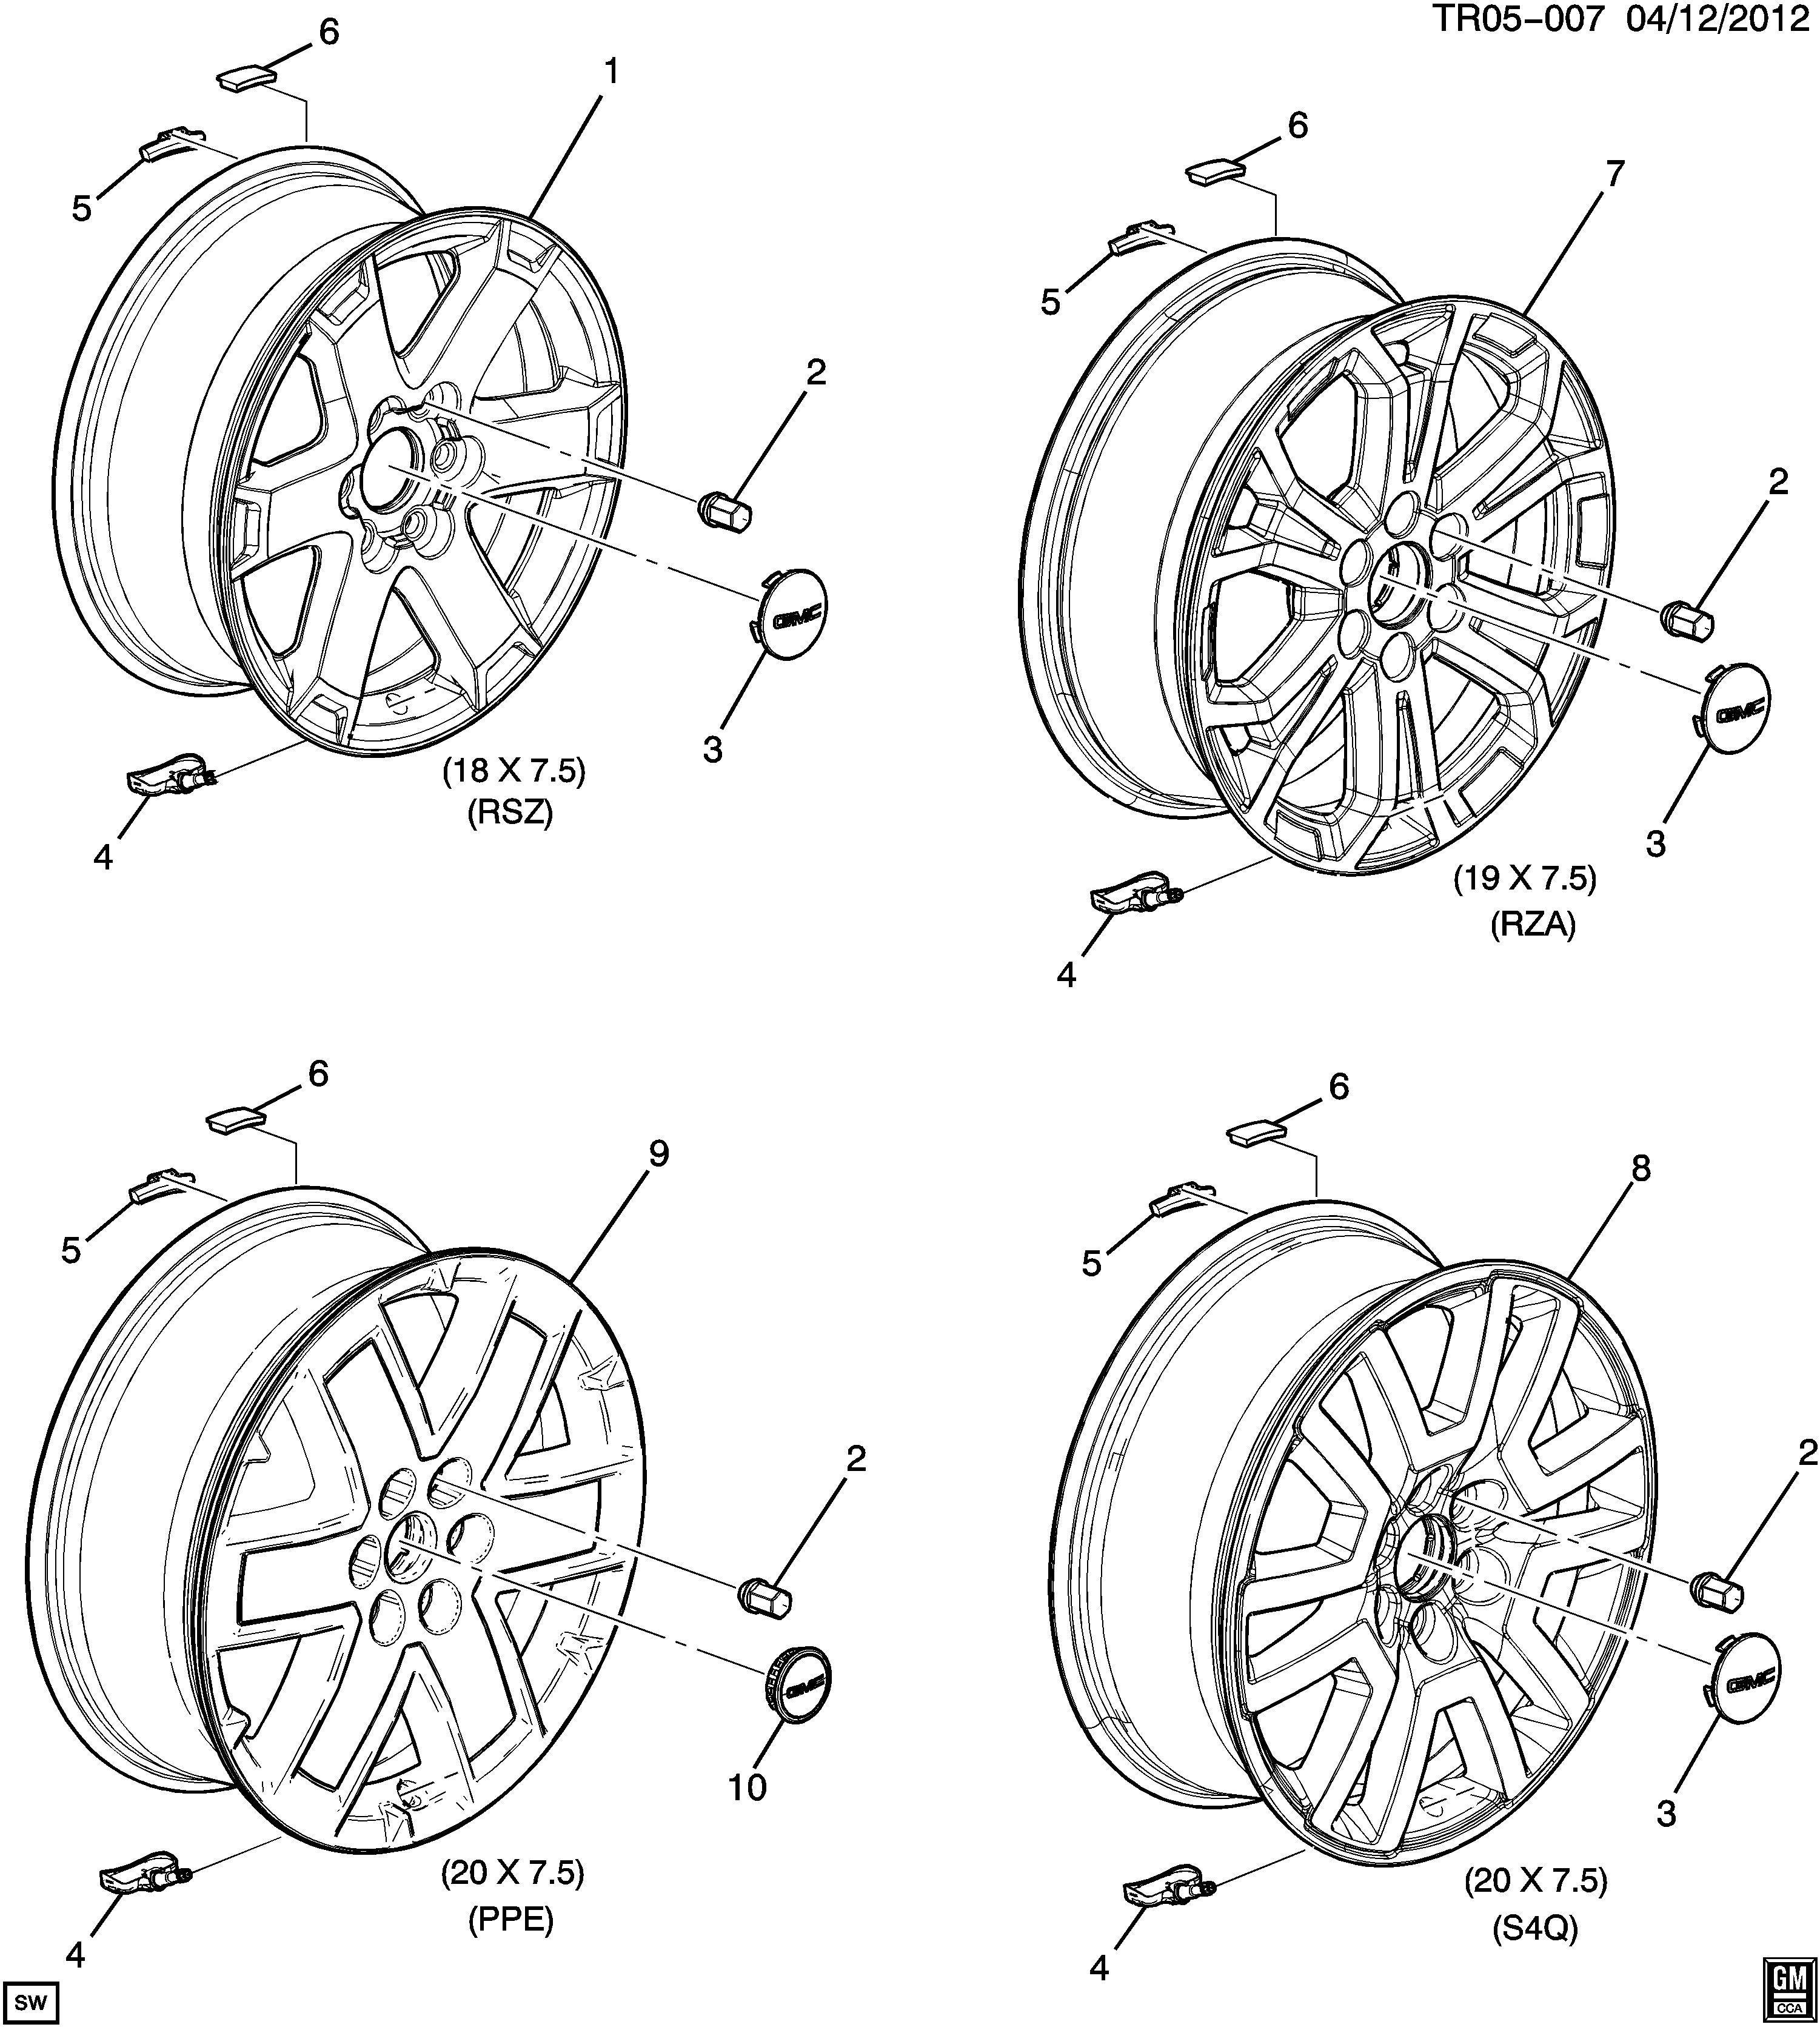 GMC ACADIA Wheel. Rear or spare. Bcbright, machinecode